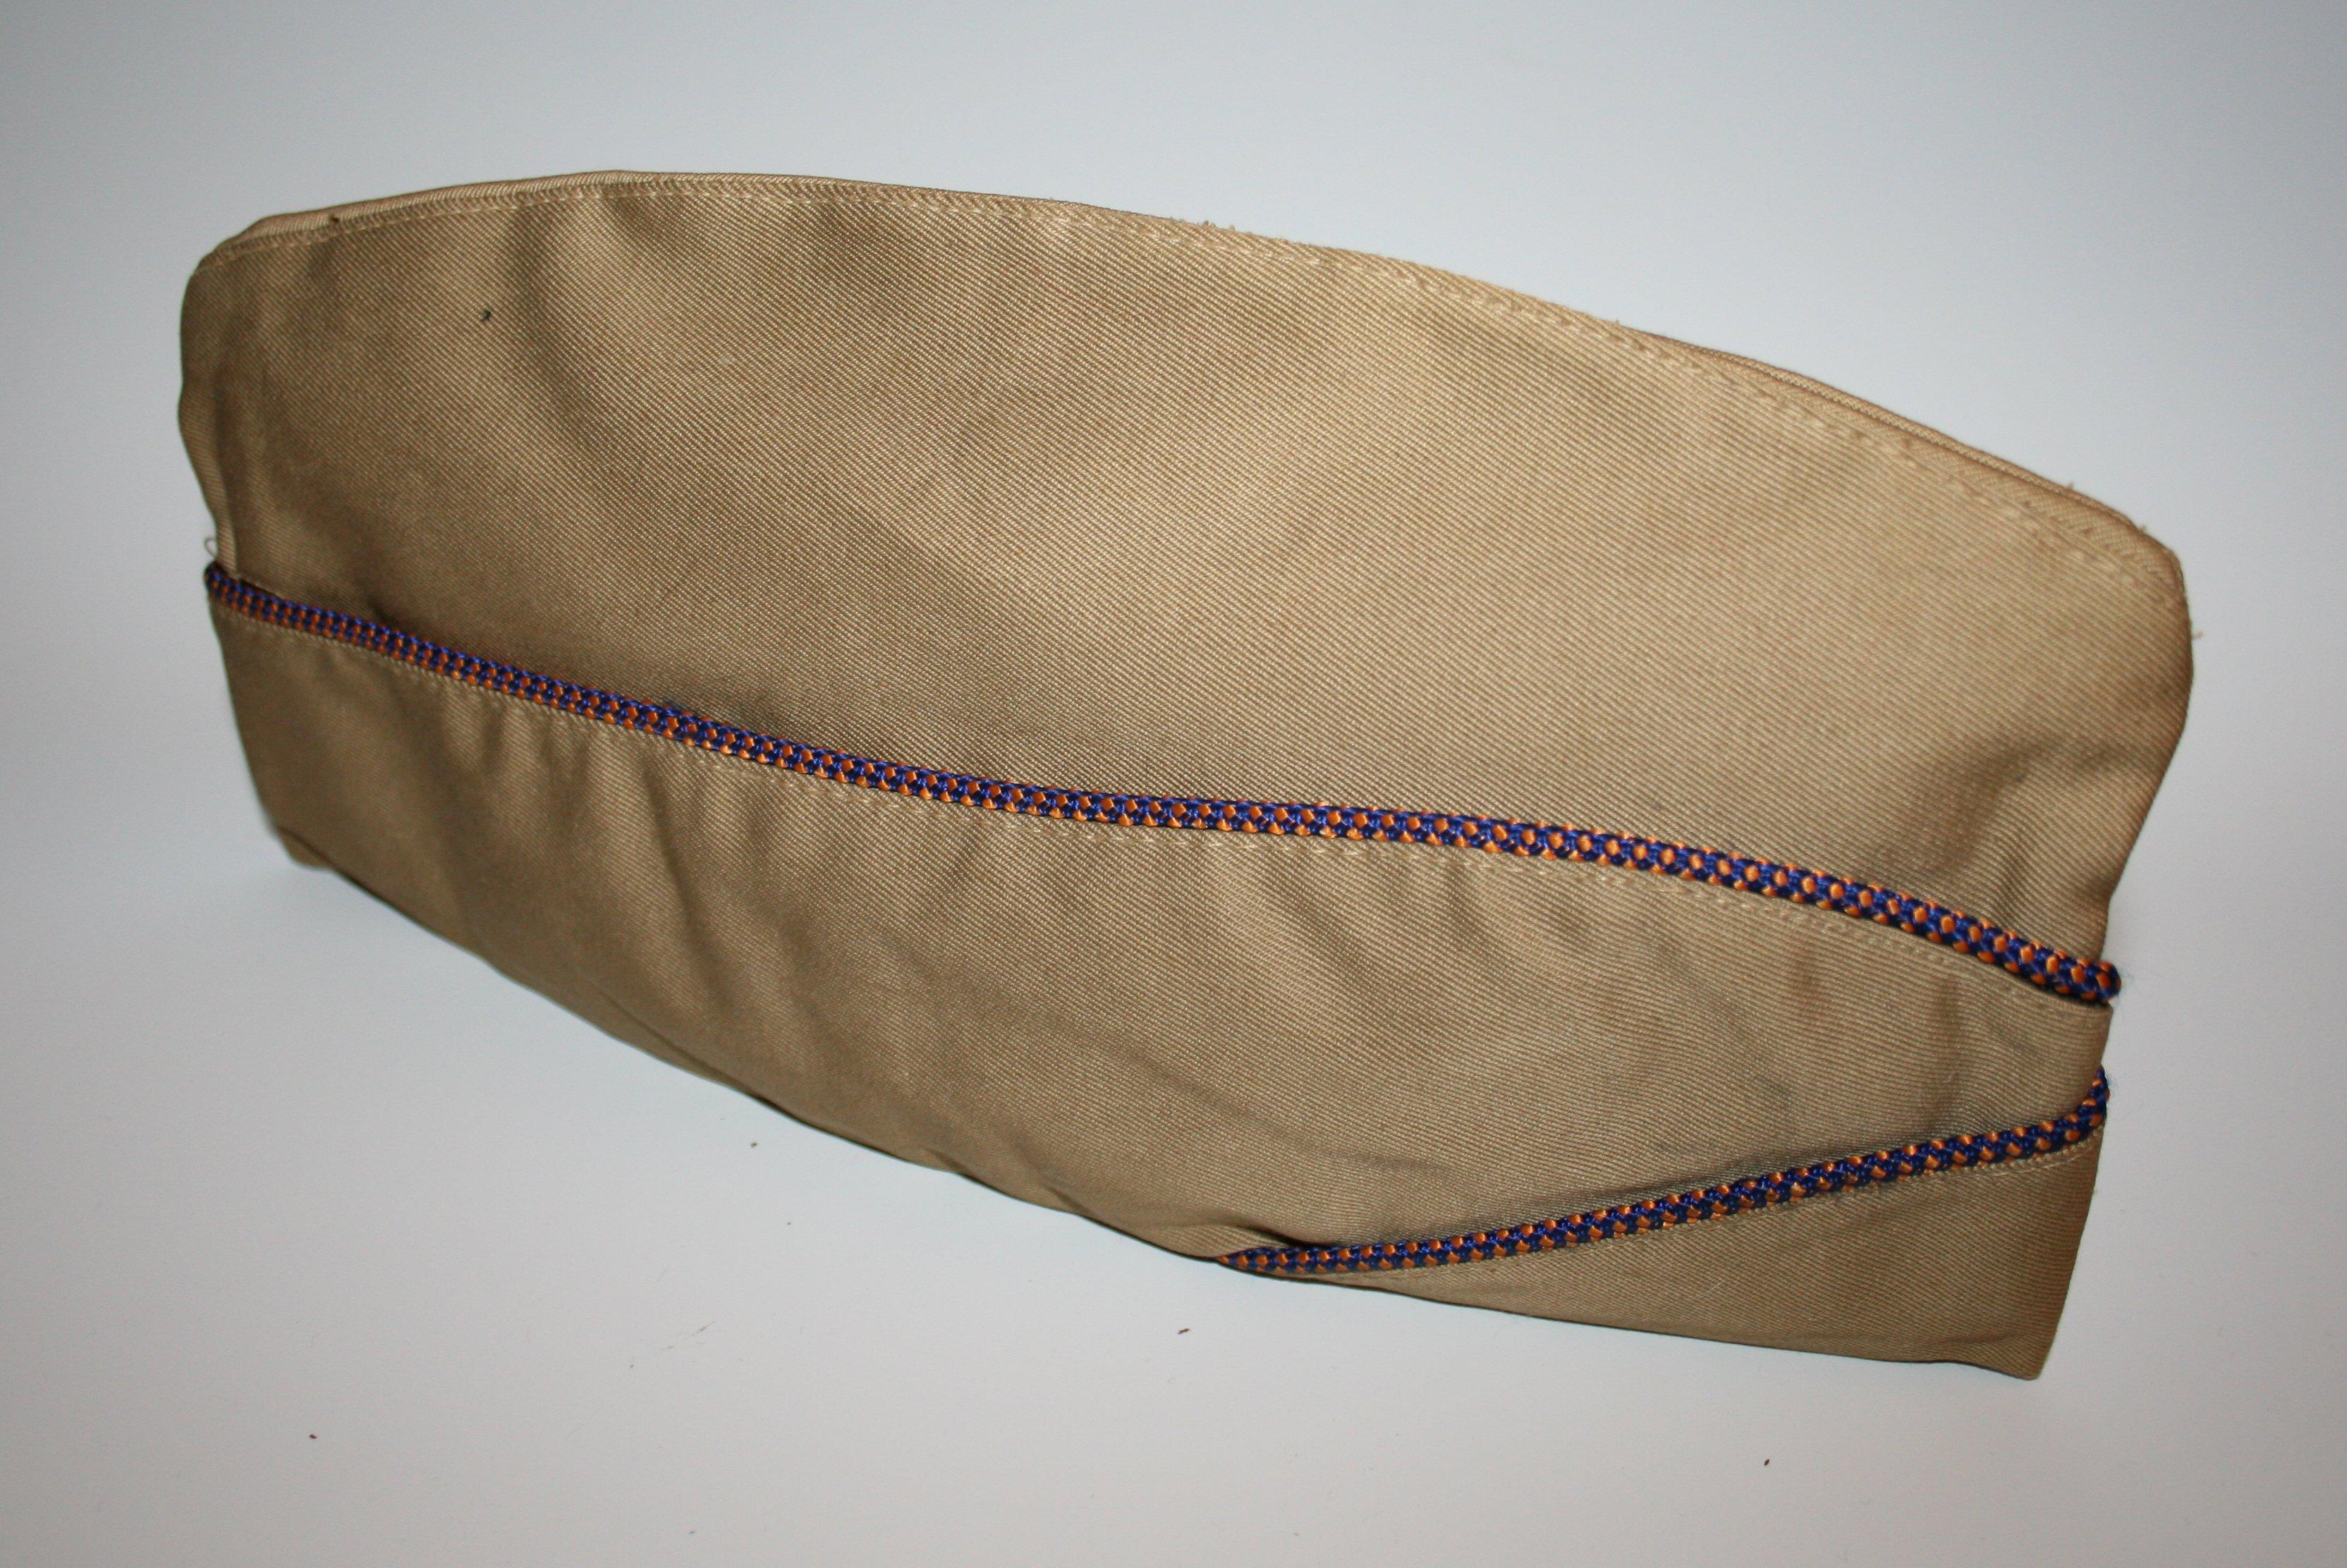 Garrison cap purse